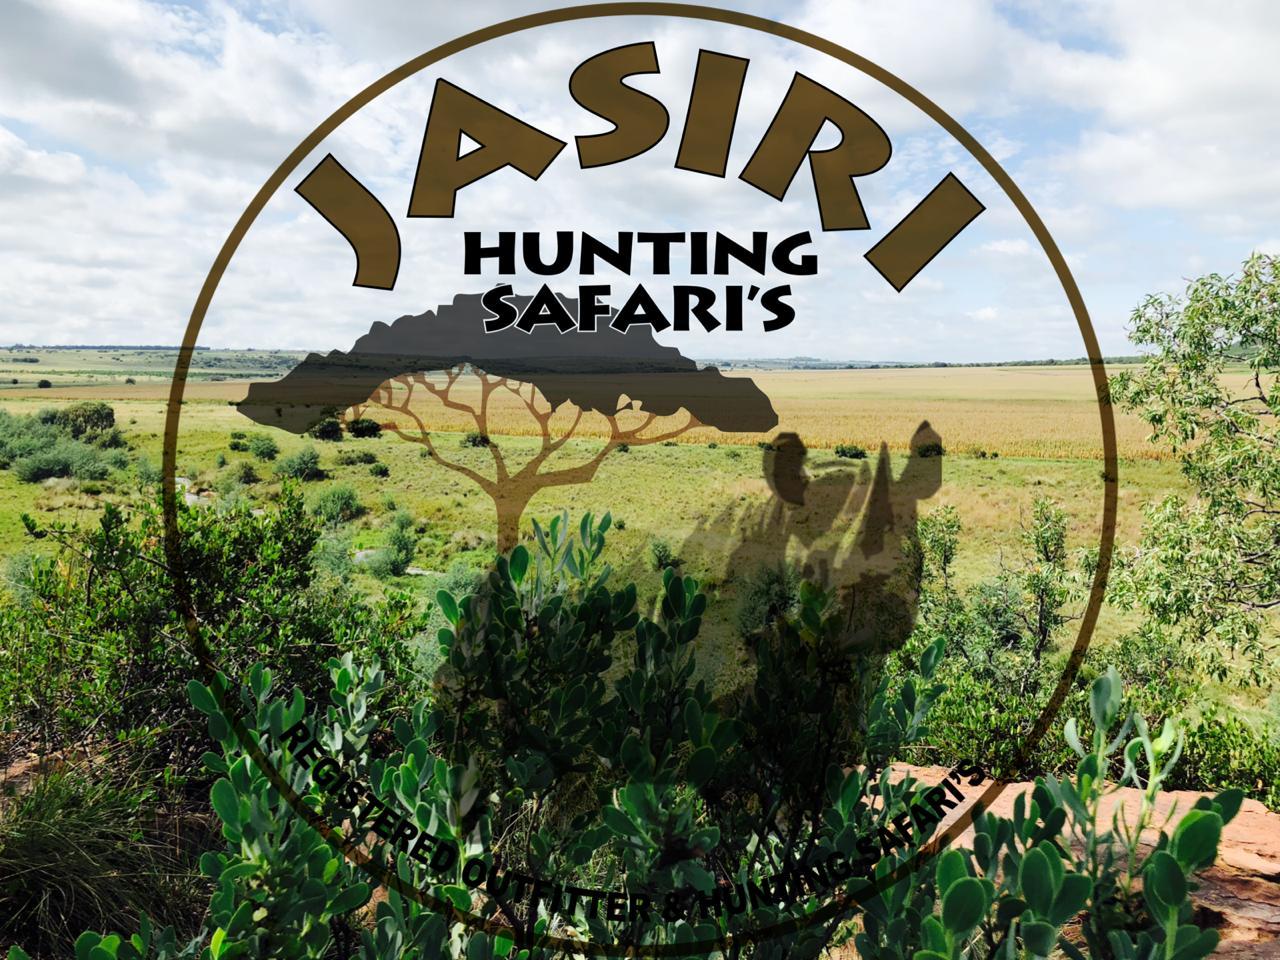 Jasiri Hunting Safaris